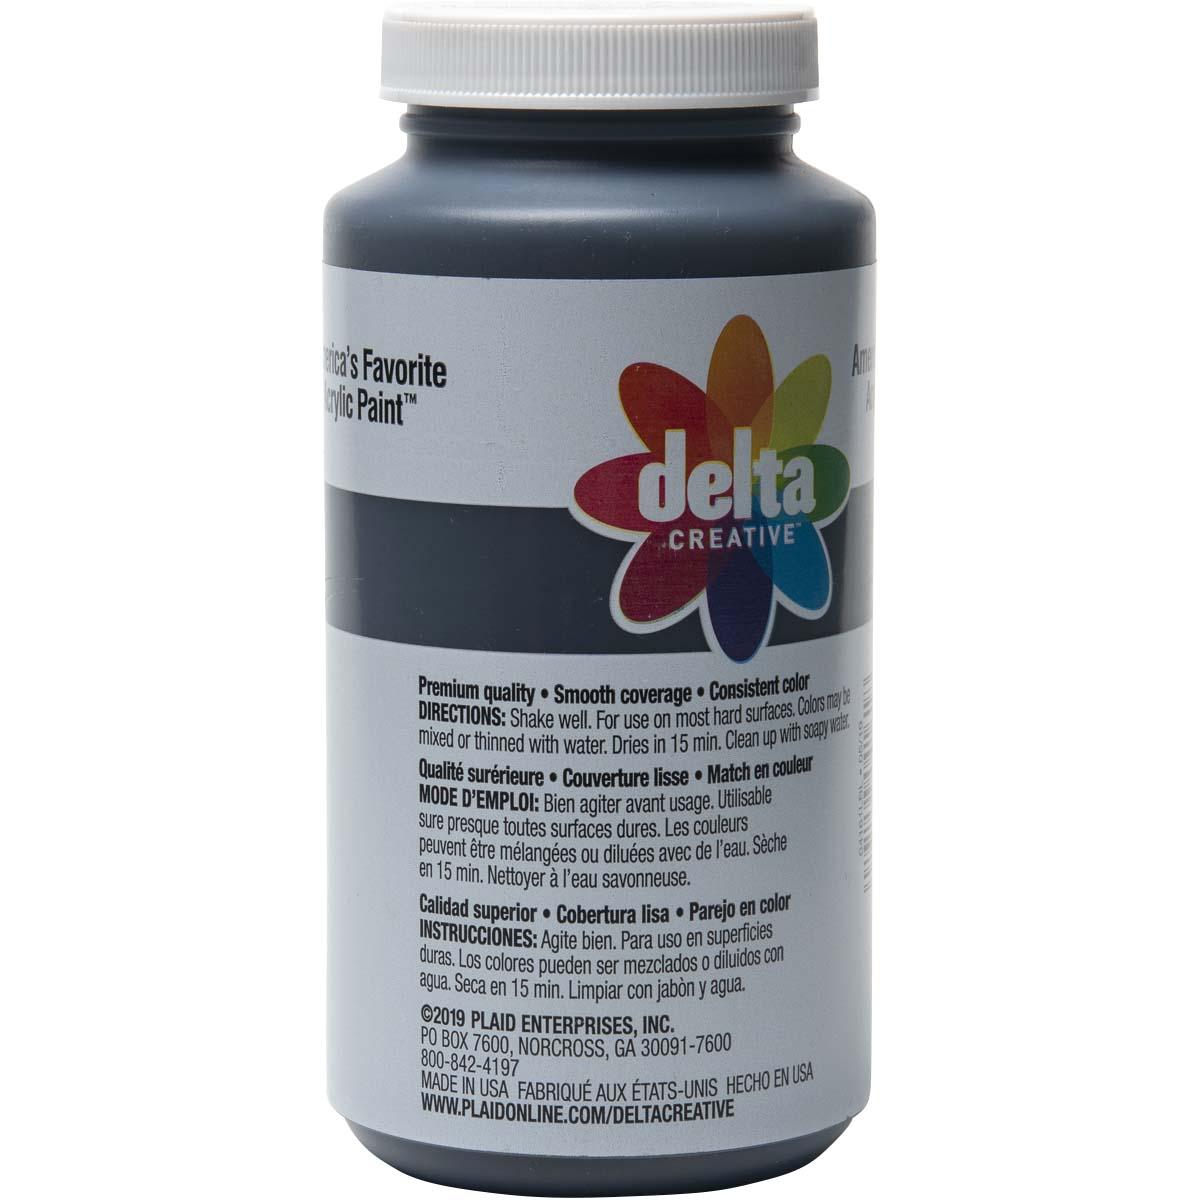 Delta Ceramcoat ® Acrylic Paint - Black, 16 oz.